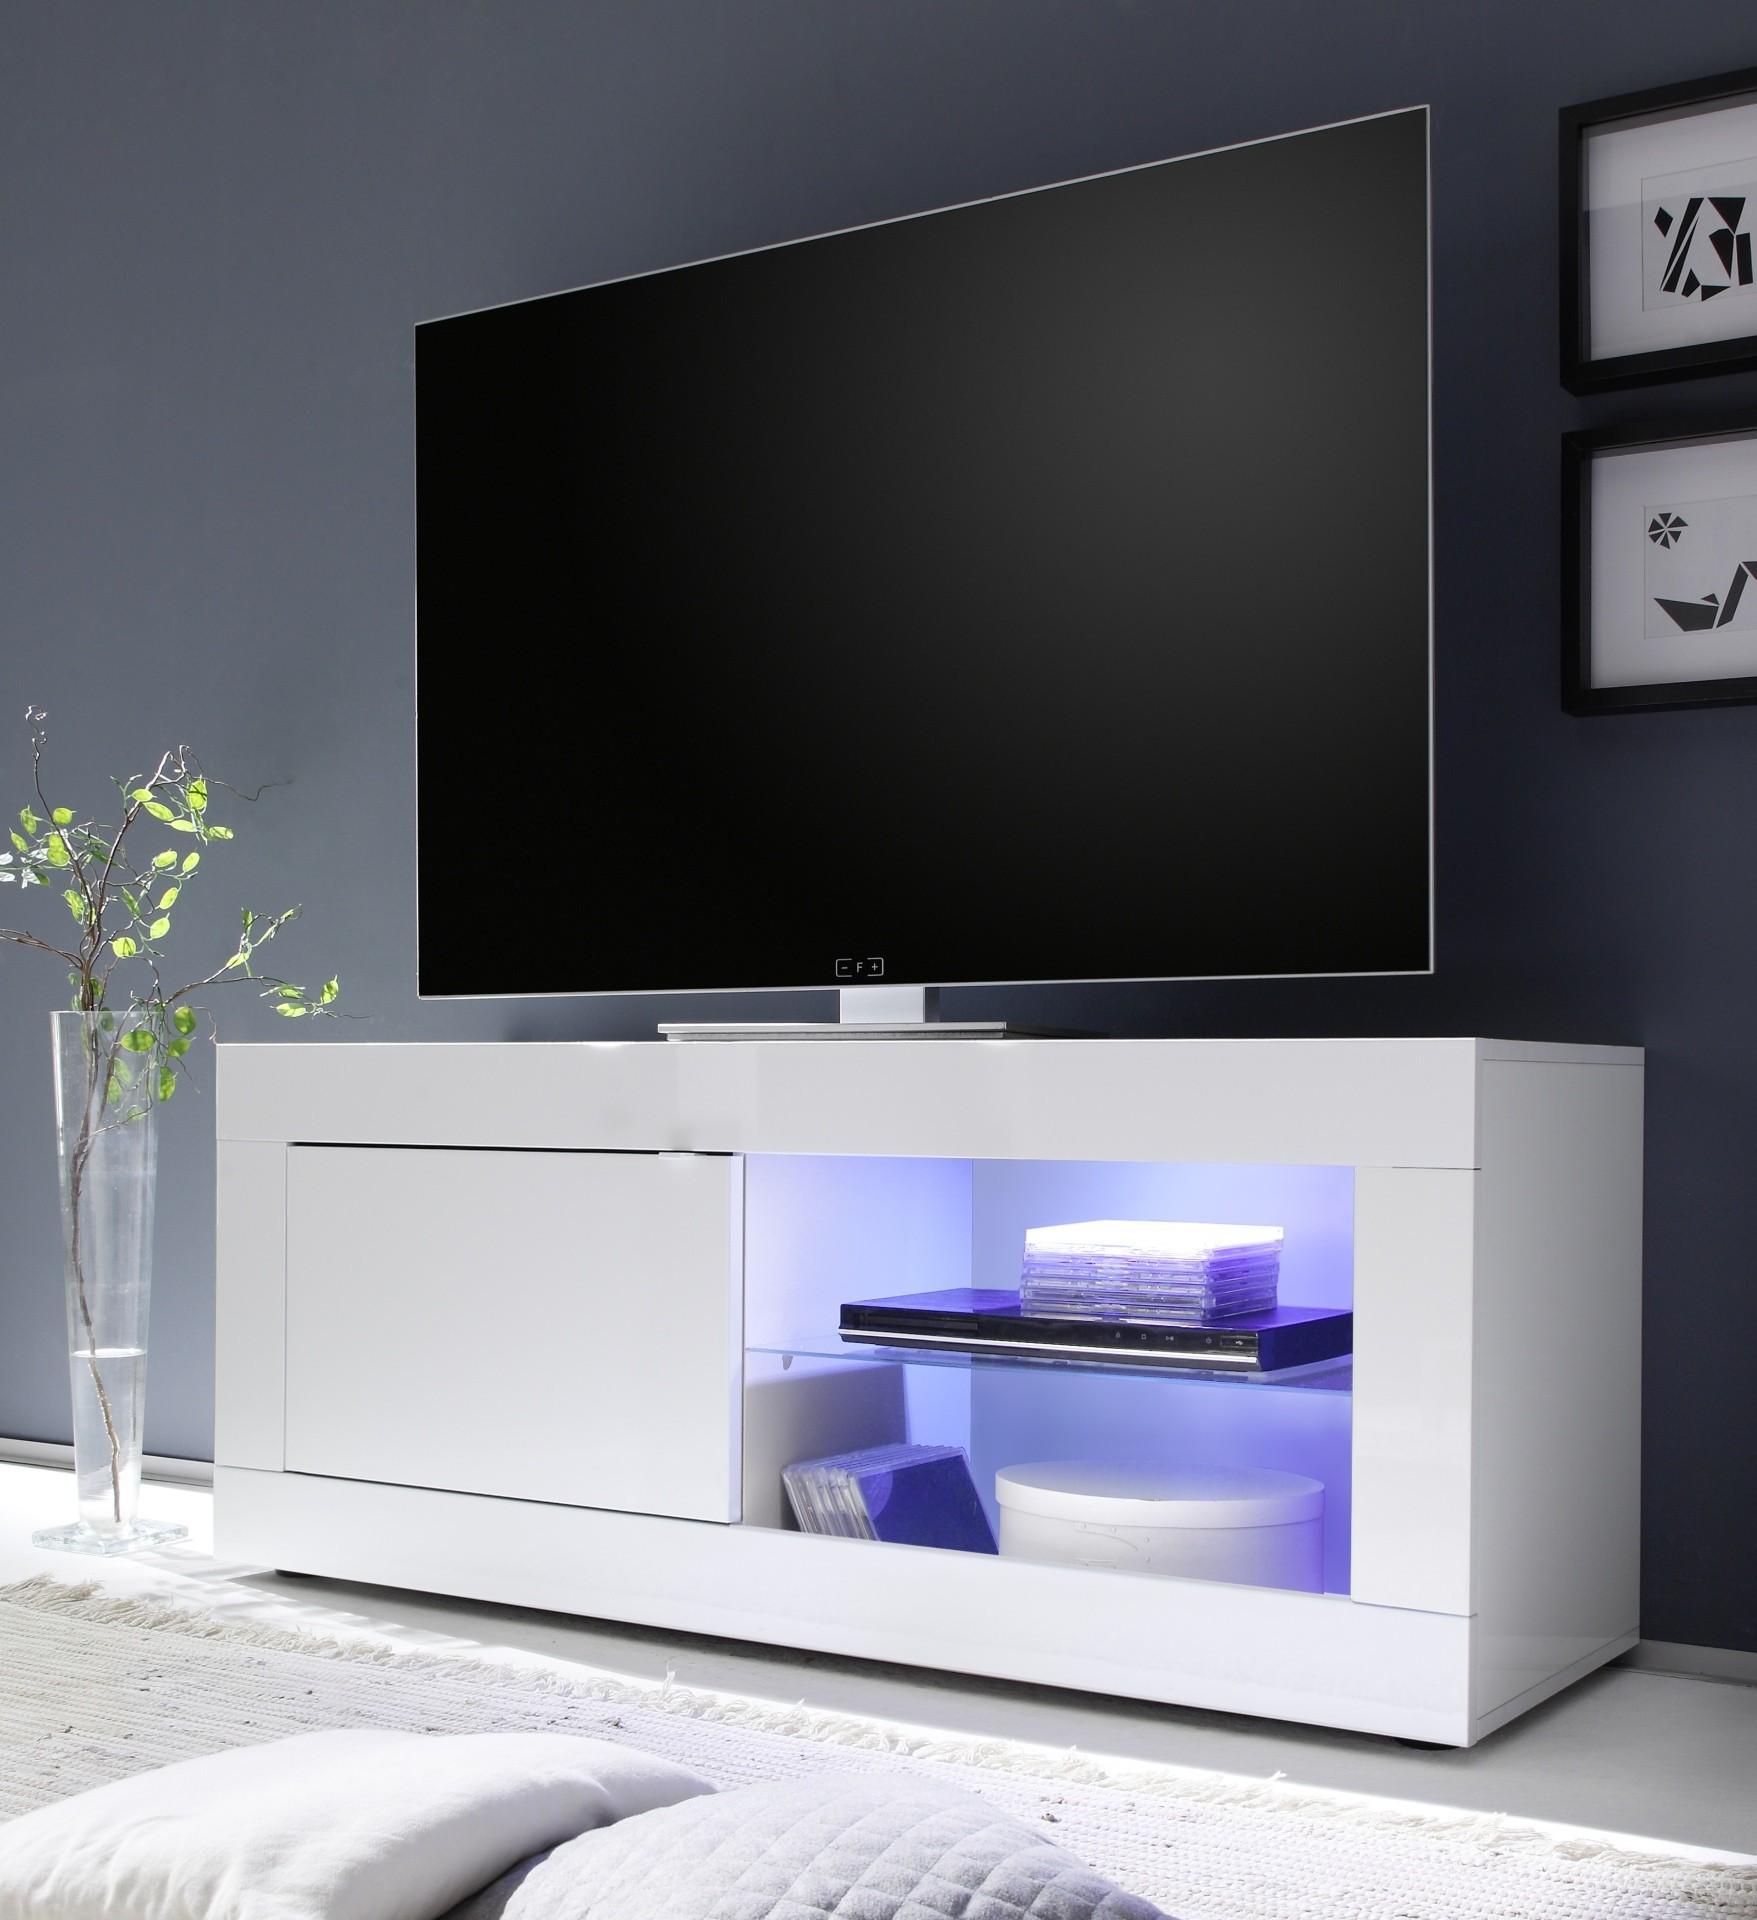 Meuble Tv Toronto Blanc 1 Porte 1 Niche Prix Discount Design Italie # Meuble Tv H Et H